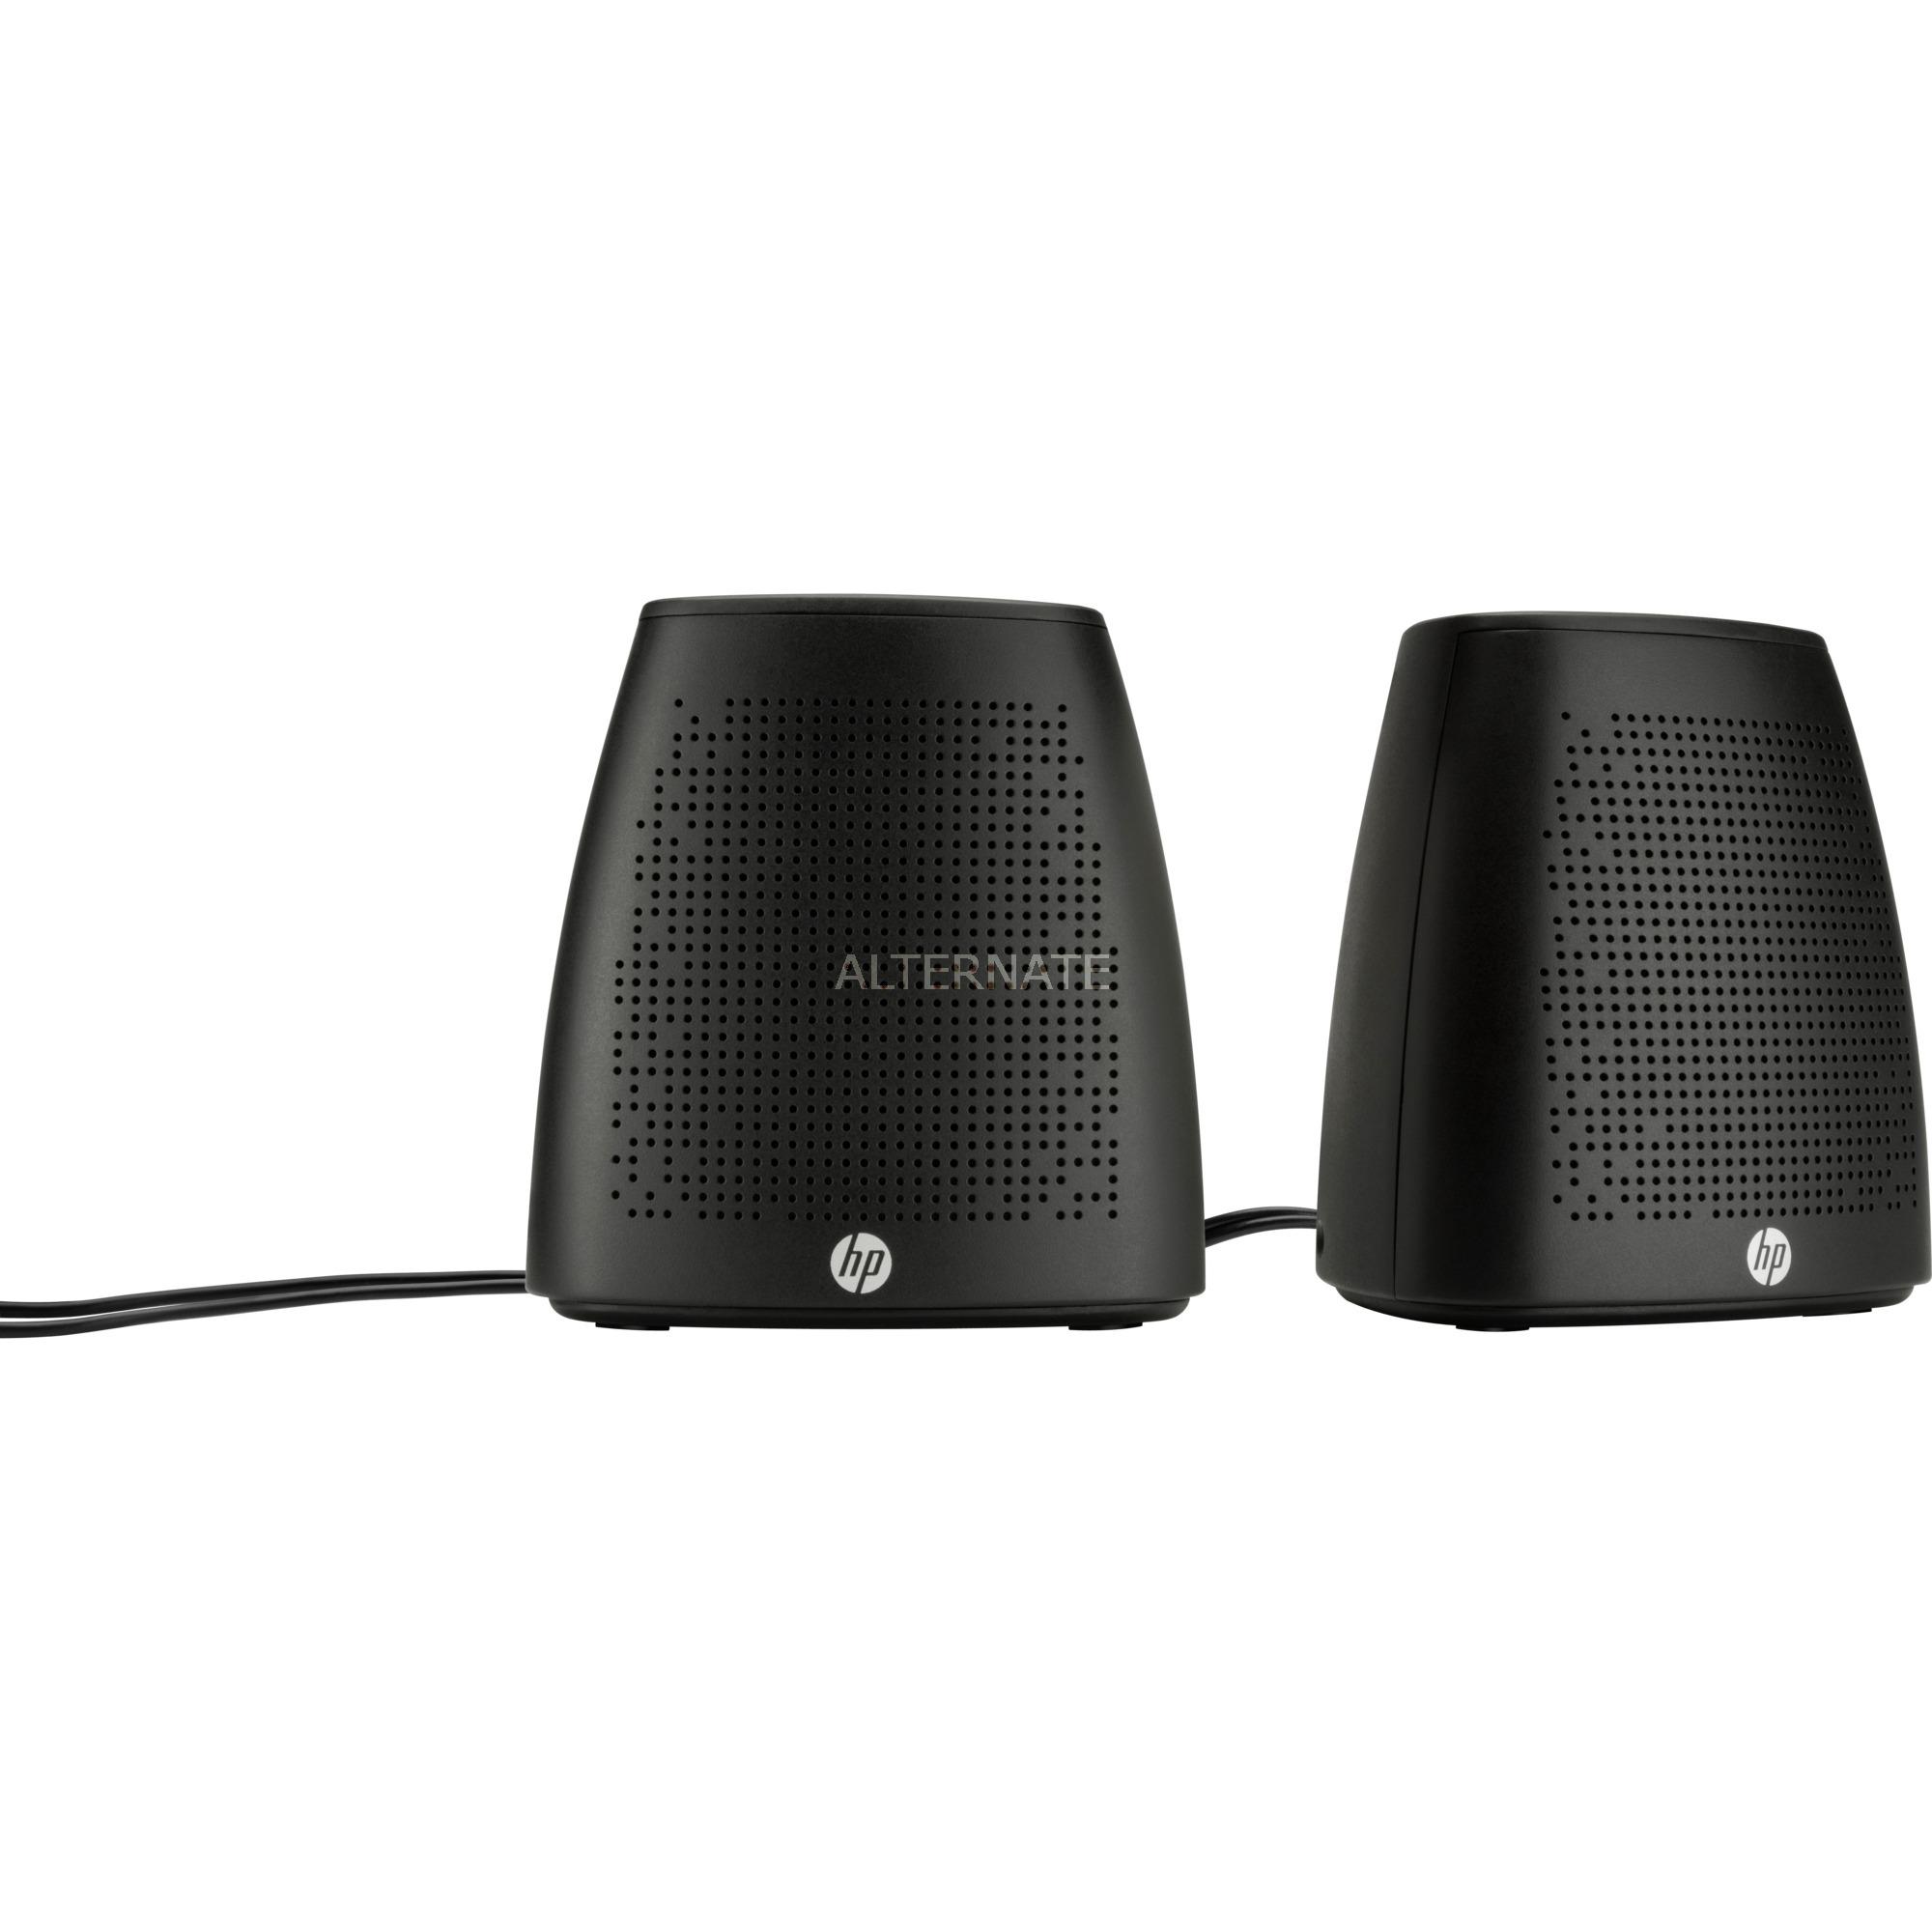 Altavoz USB negro S3100, Altavoces de PC